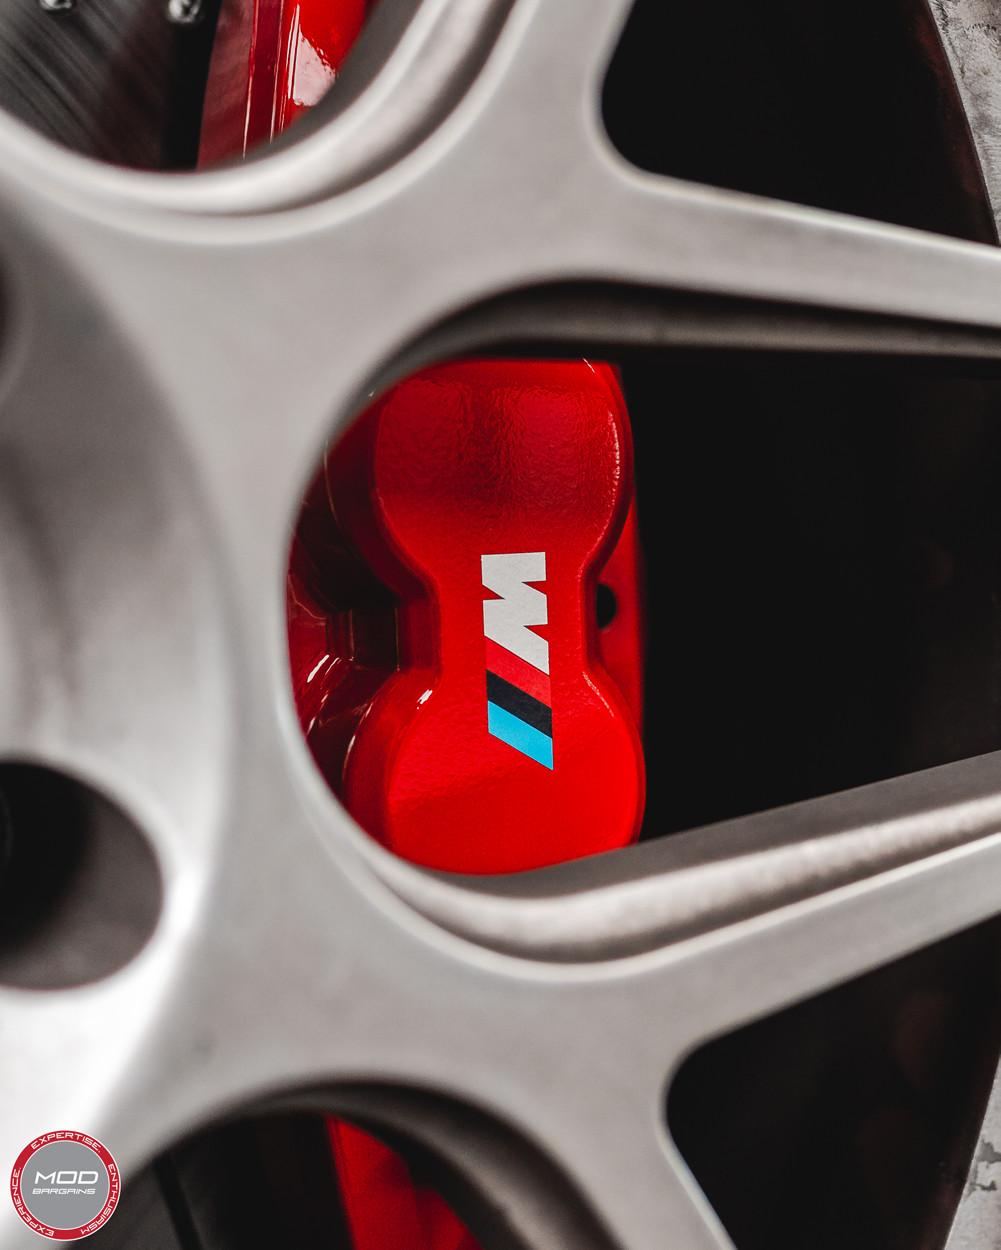 Red BMW M Performance Big Brake Kit for 2012+ BMW 328i/335i [F30] 34112221445/34206797600